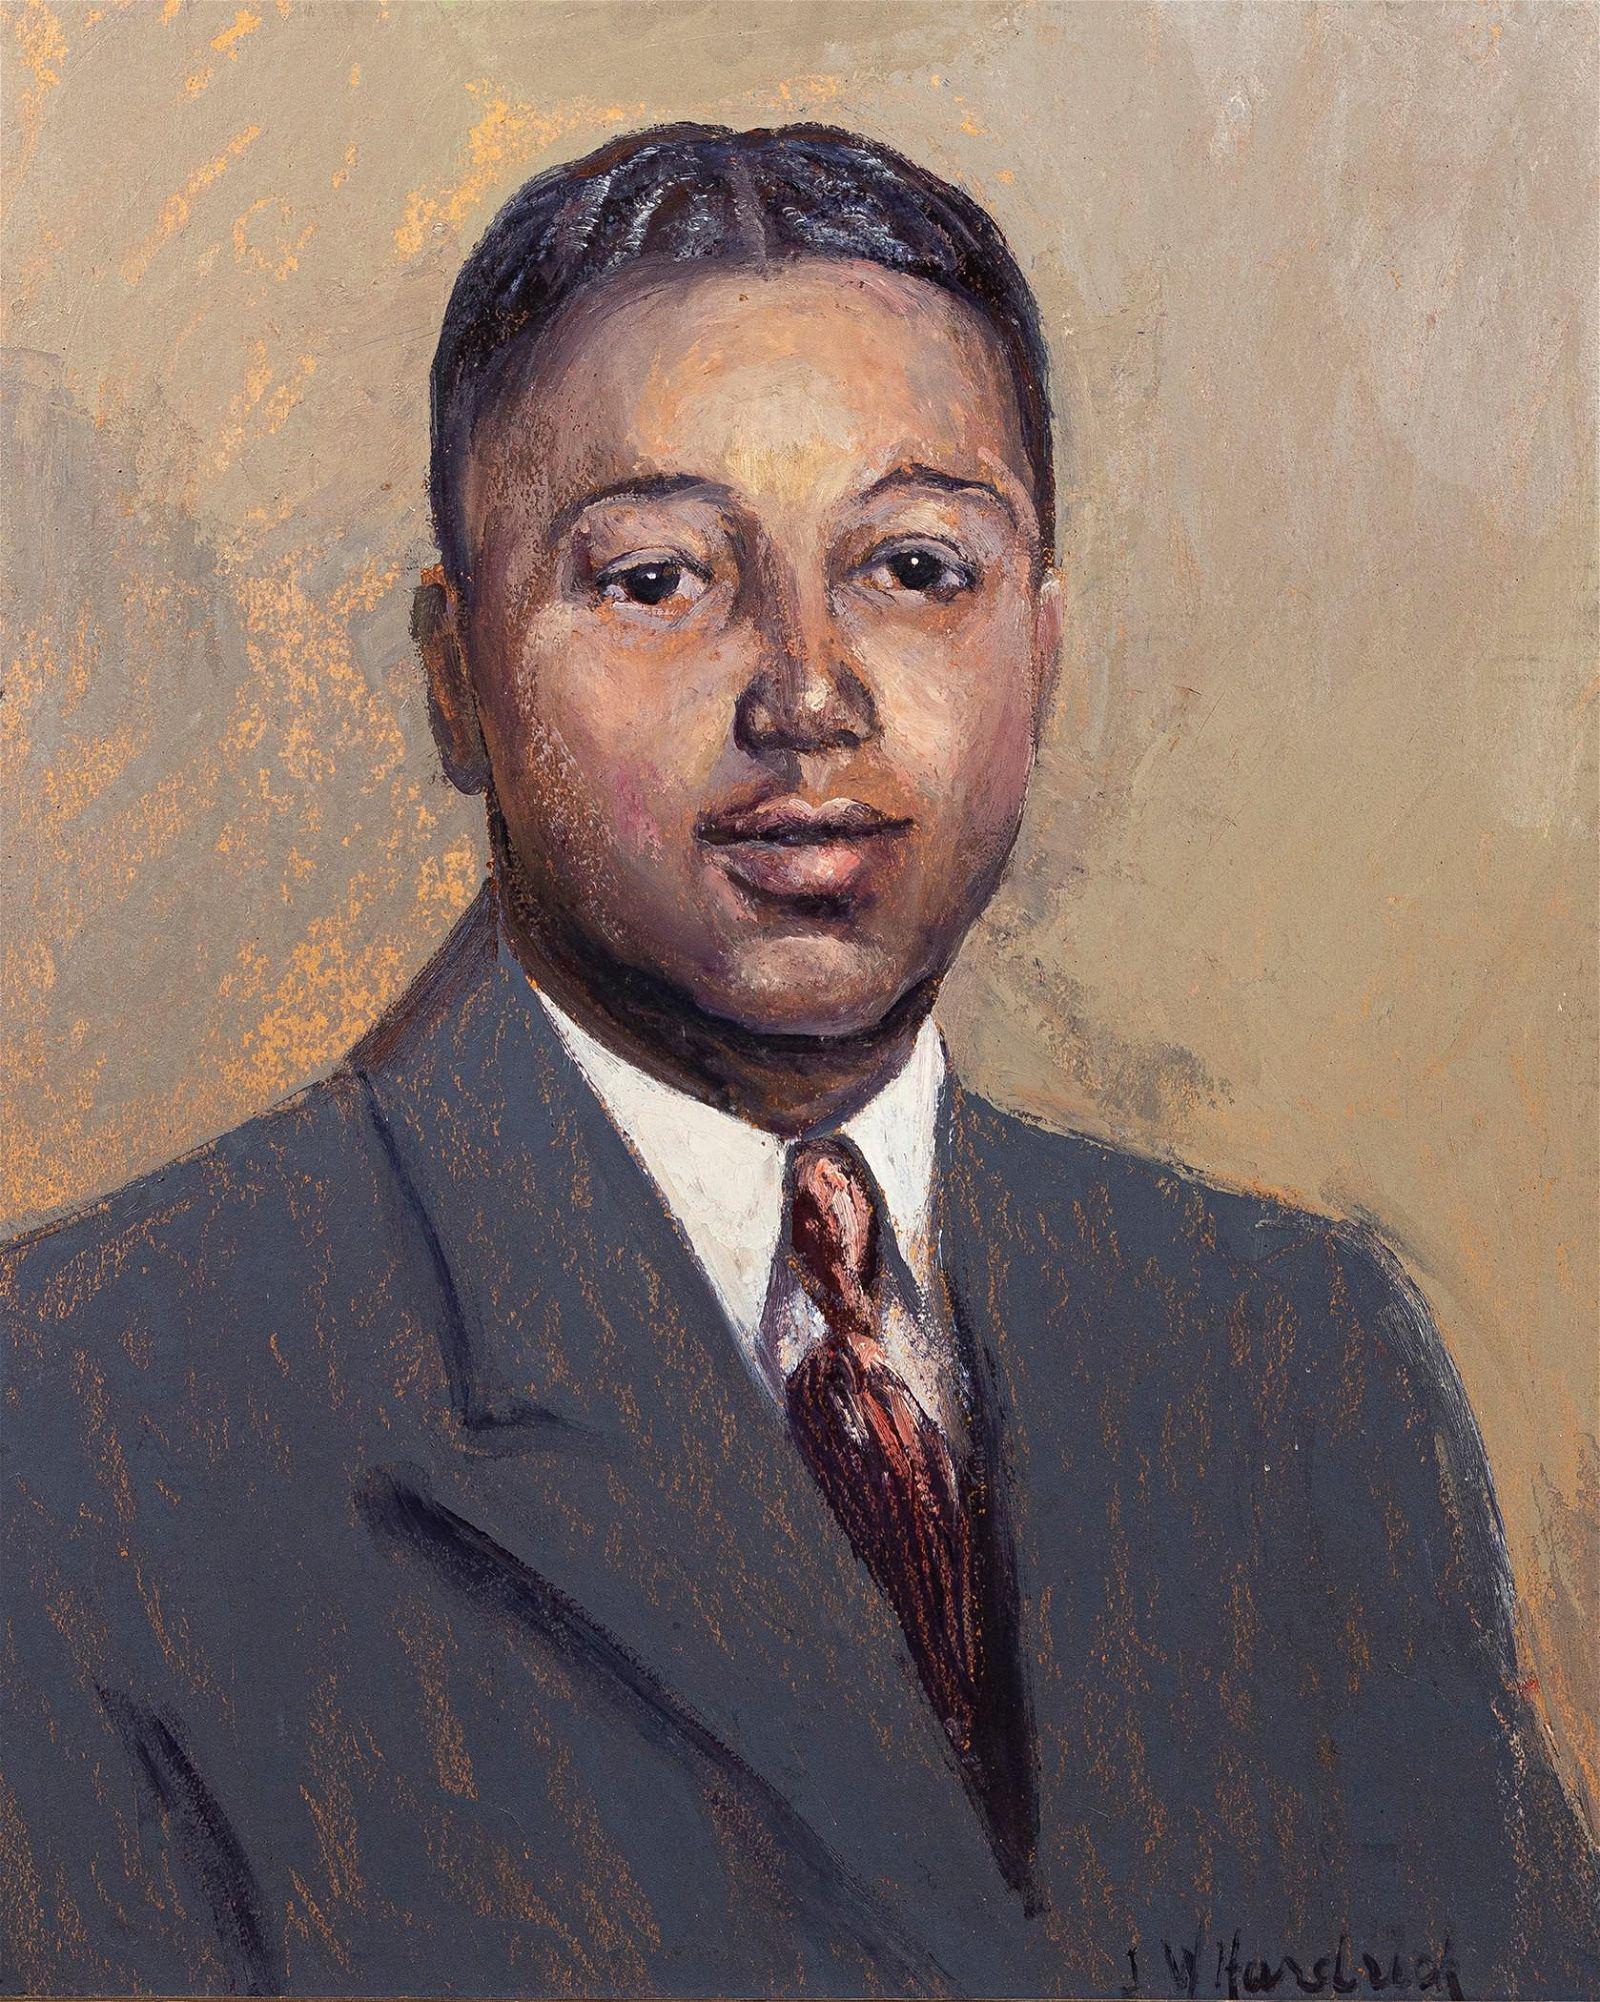 John Wesley Hardrick, 1891-1968, Portrait of a Man